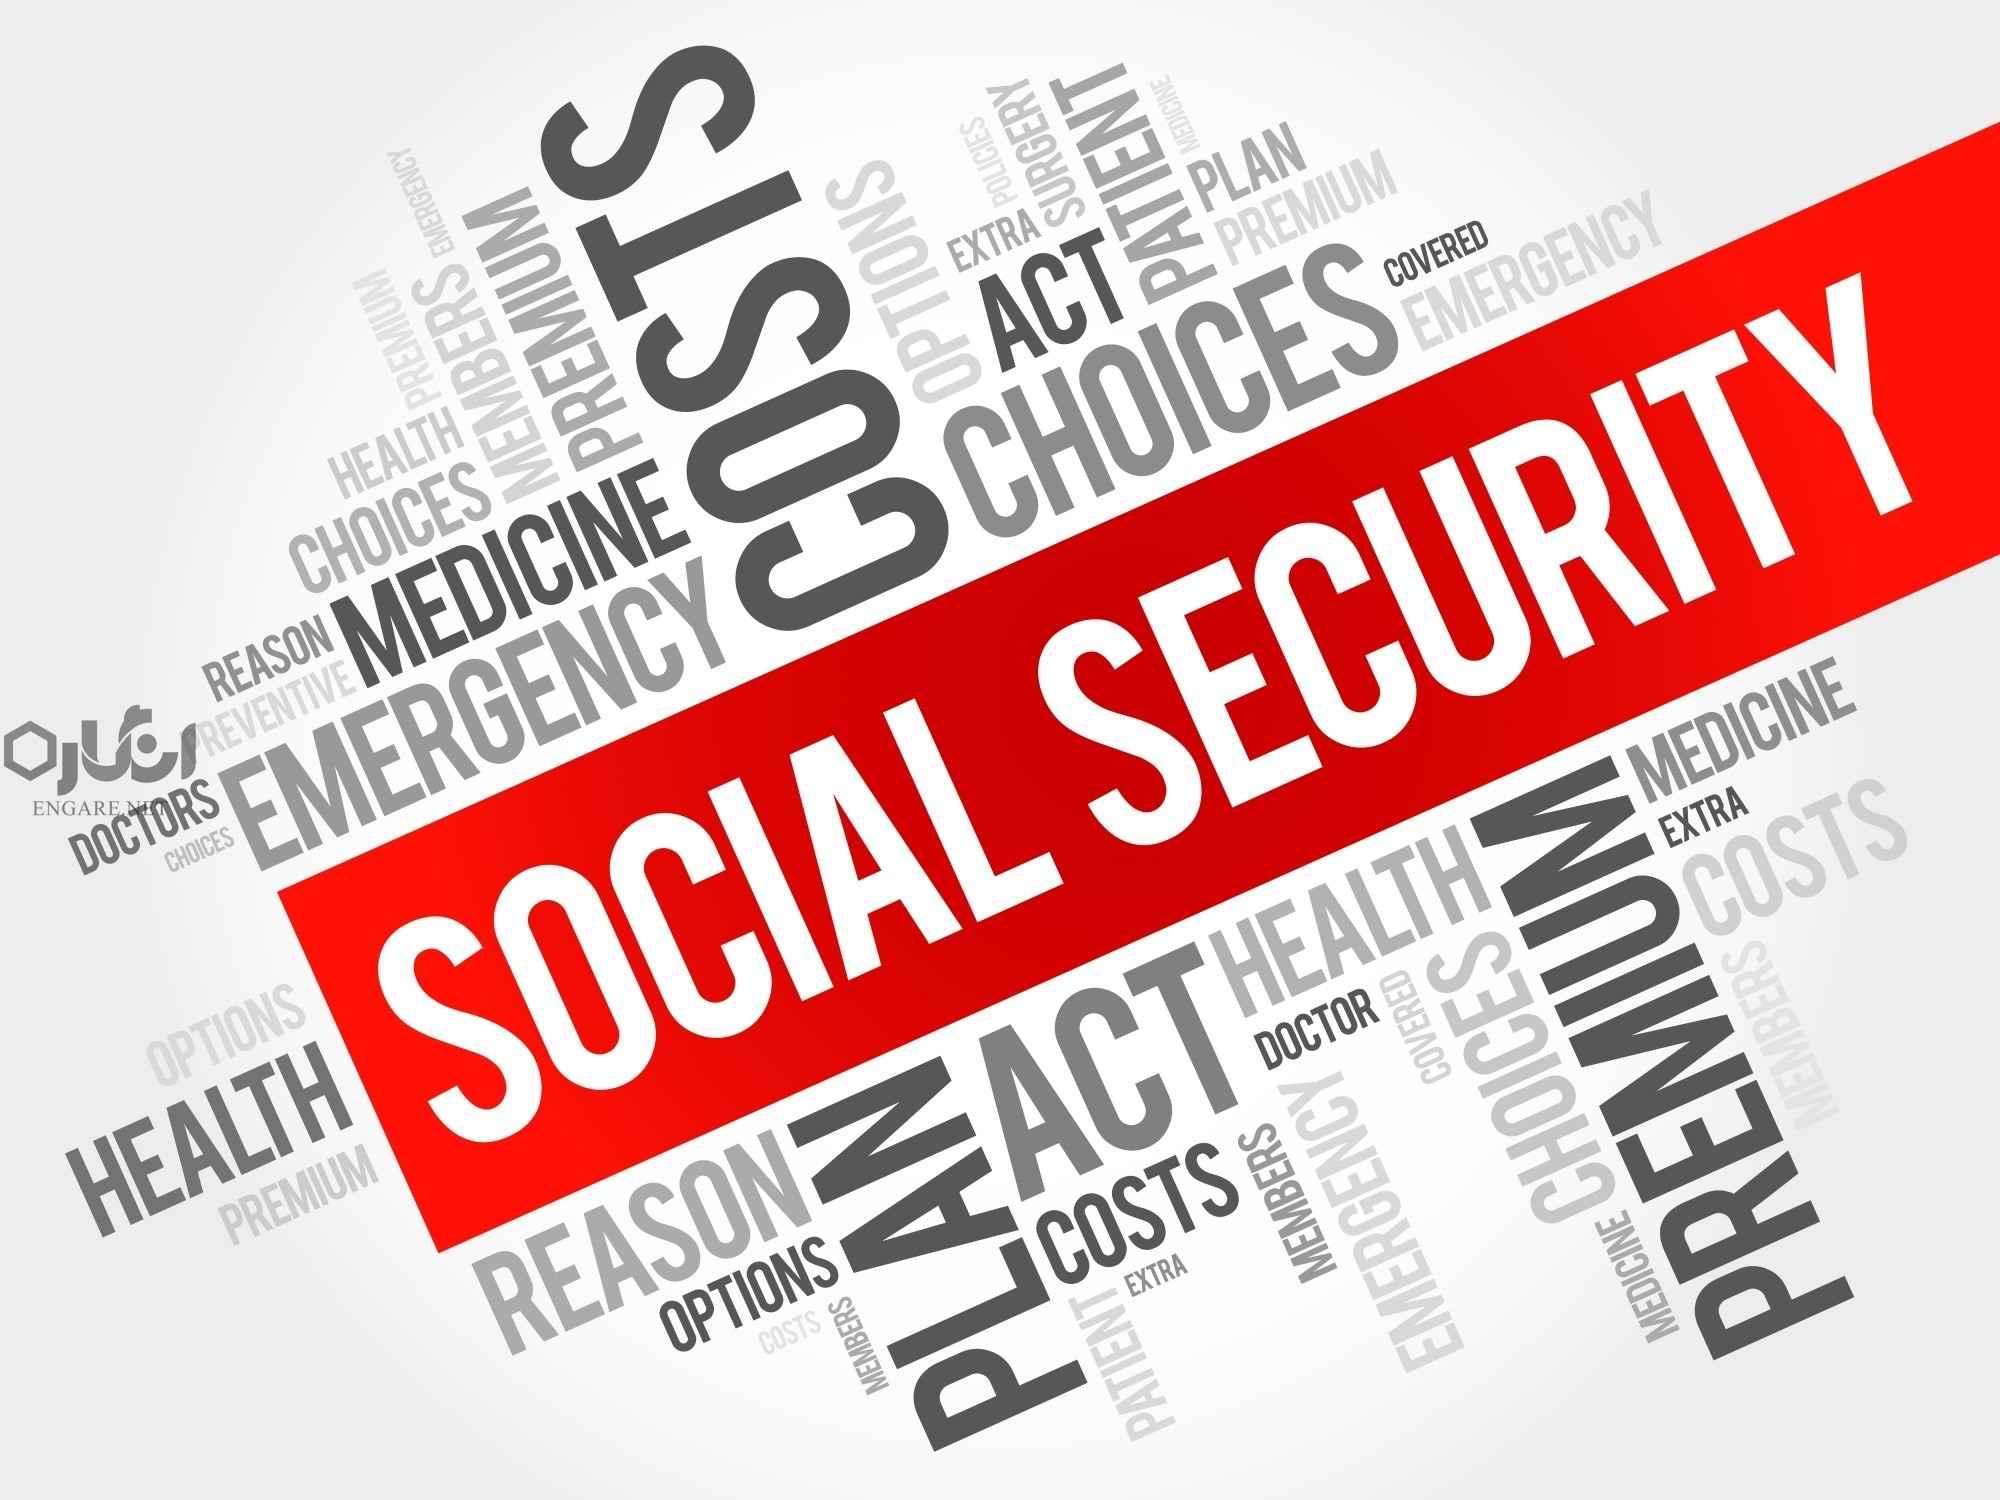 social security - سیاست اجتماعی چیست؟ - مهدیس کامکار, مفهوم سیاست گذاری اجتماعی, سیاستهای اجتماعی و رفاه اجتماعی, سیاستگذاری, سیاست گذاری اجتماعی چیست, سیاست گذاری اجتماعی, سیاست اجتماعی در ایران, سیاست اجتماعی چیست؟, سیاست اجتماعی, رفاه اجتماعی, رفاه, خدمات اجتماعی, تأمین اجتماعی, بهزیستی, اقتصاد آزاد, Social Policy & Protection